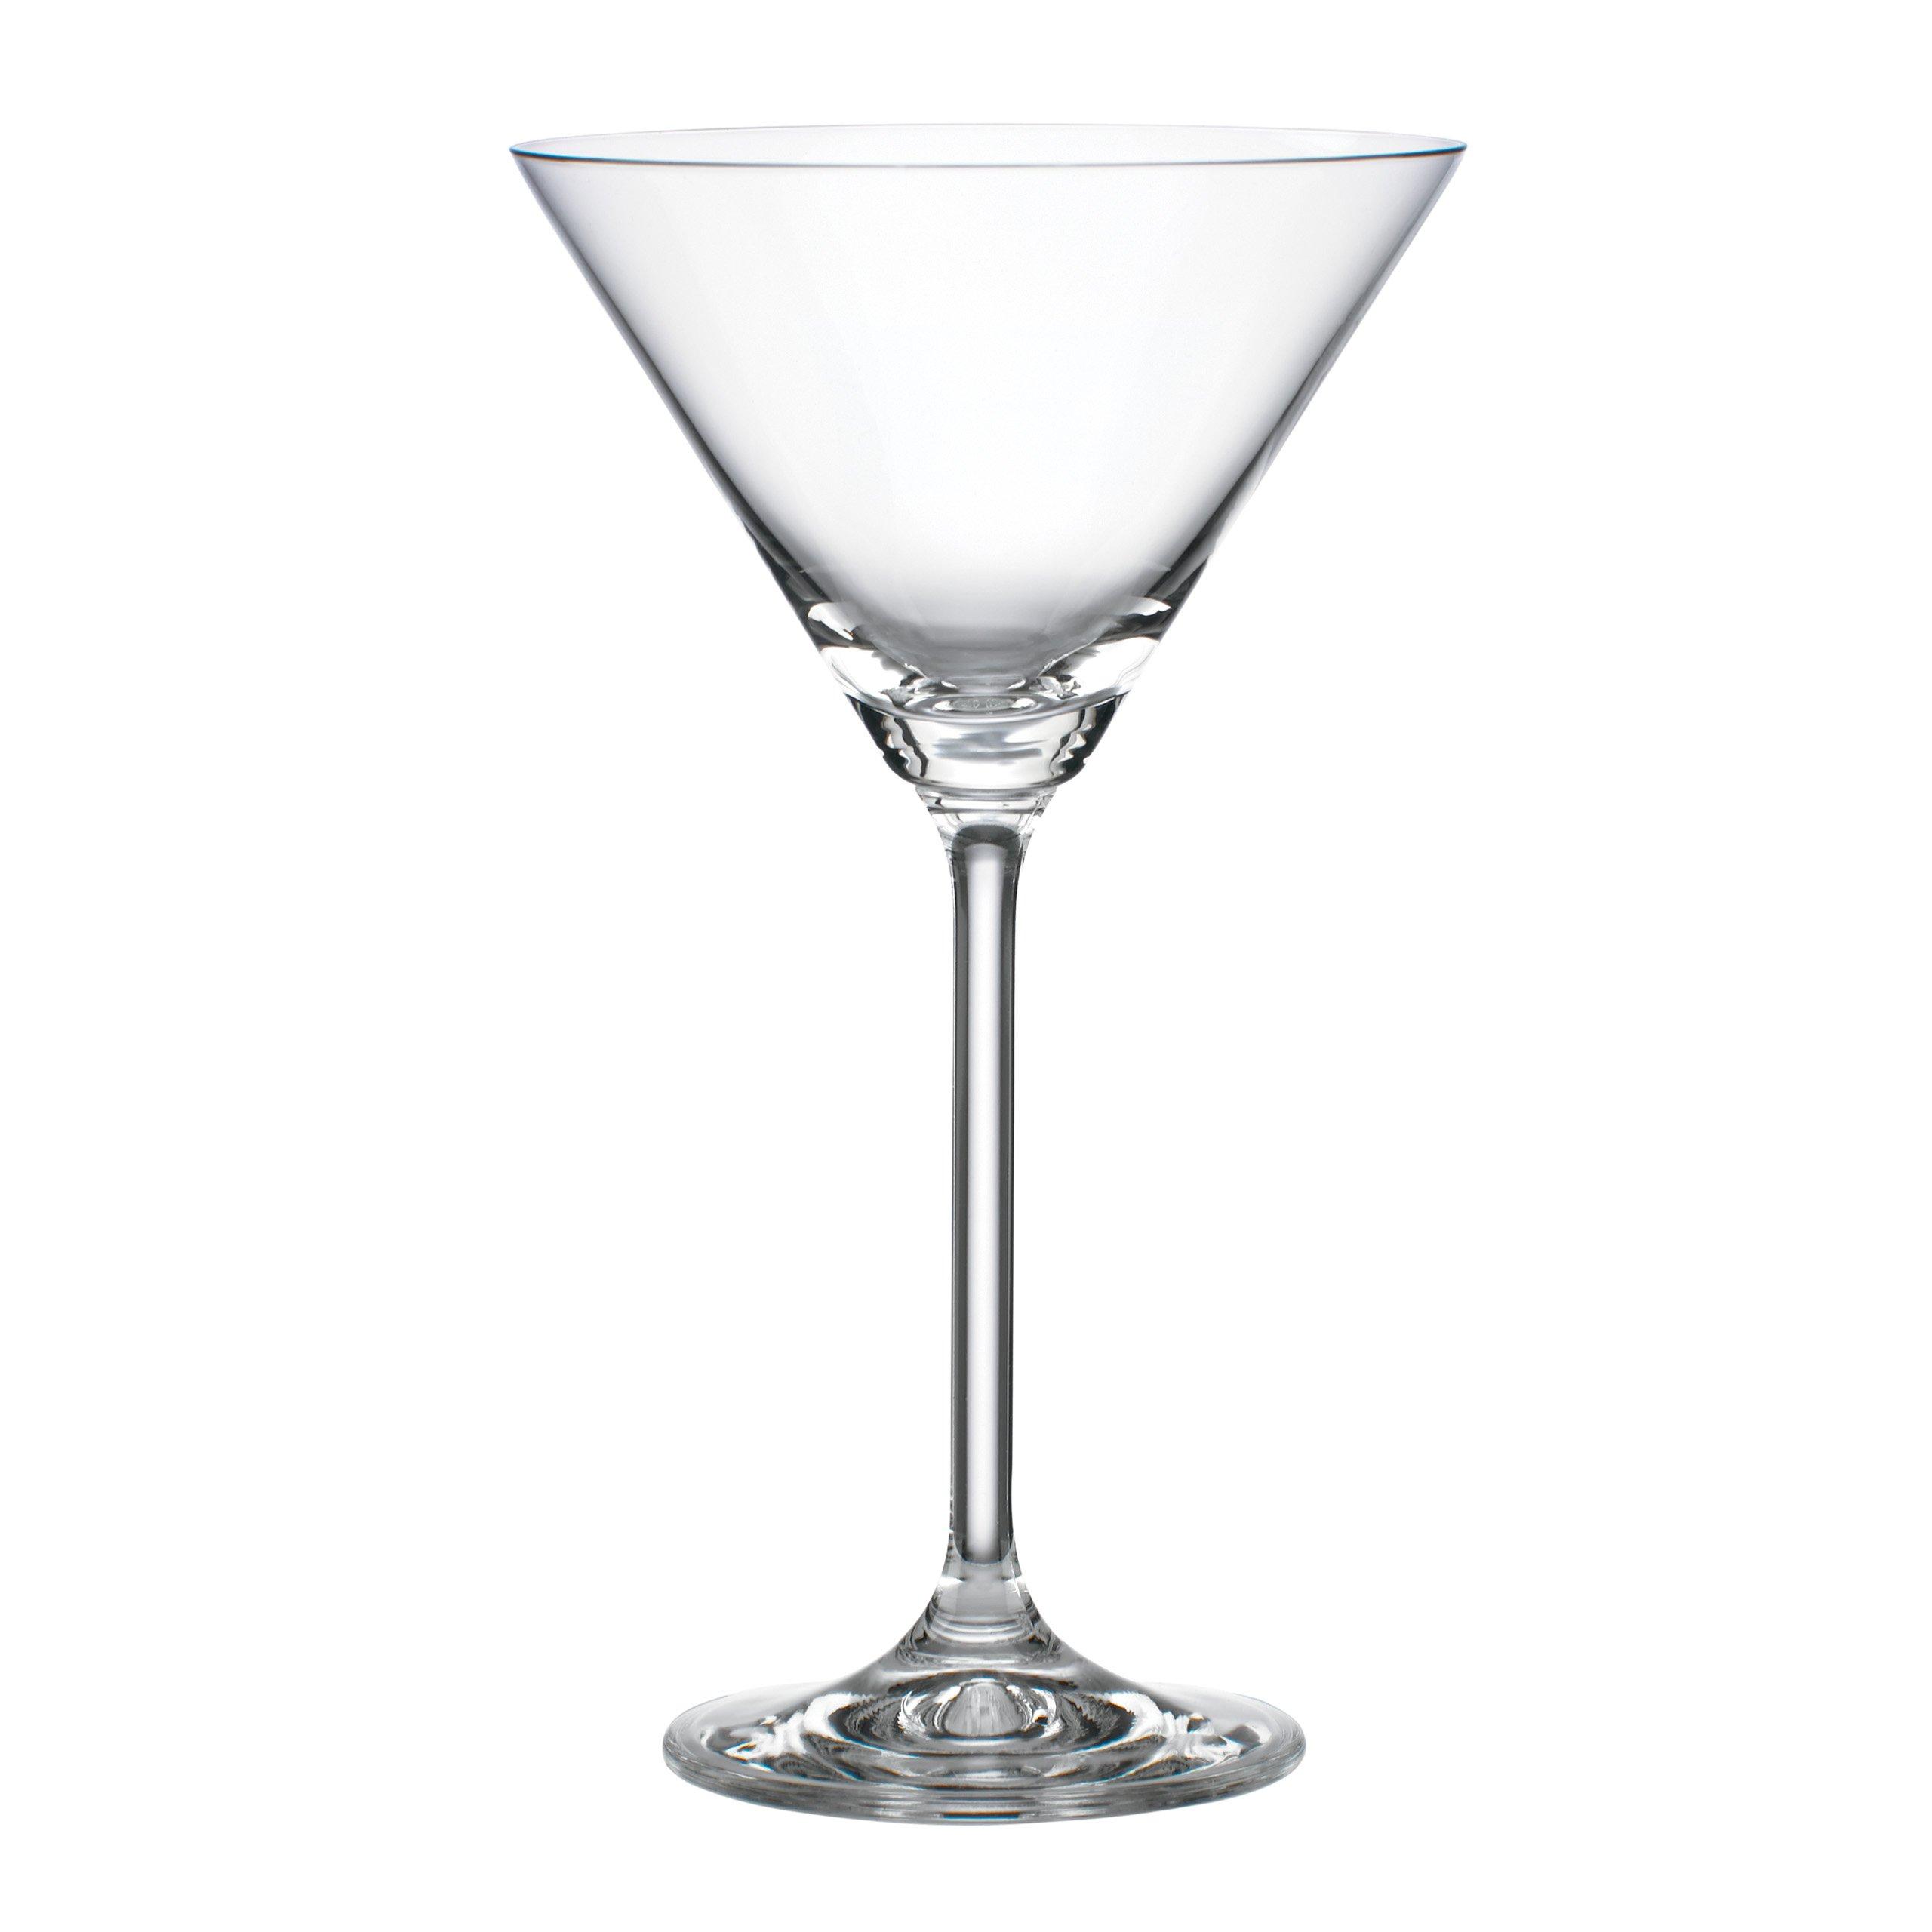 Lenox Tuscany Classics Martini Glasses Buy 4 Get 6